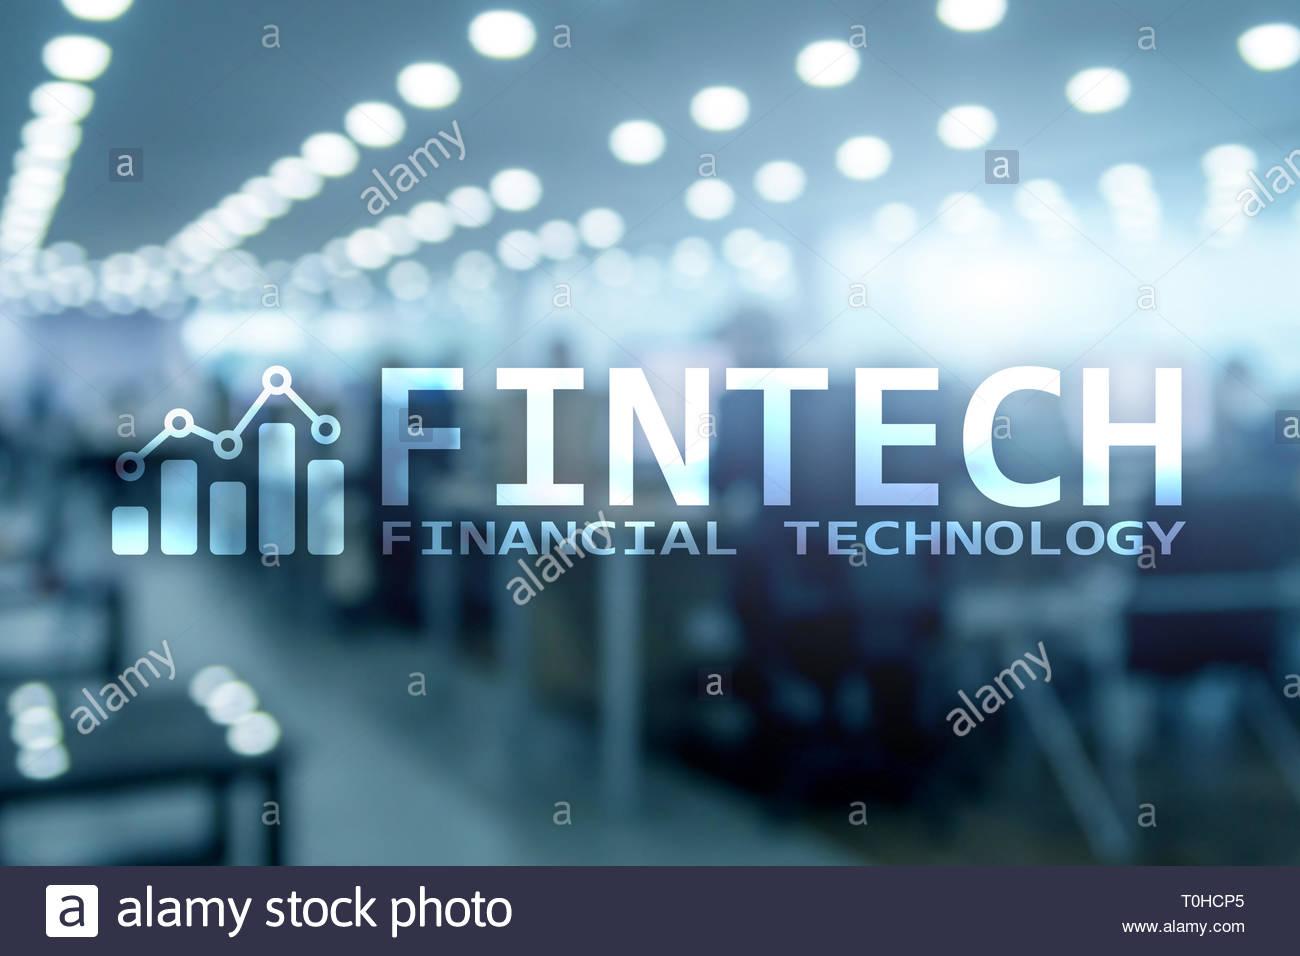 FINTECH   Financial technology global business and information 1300x956